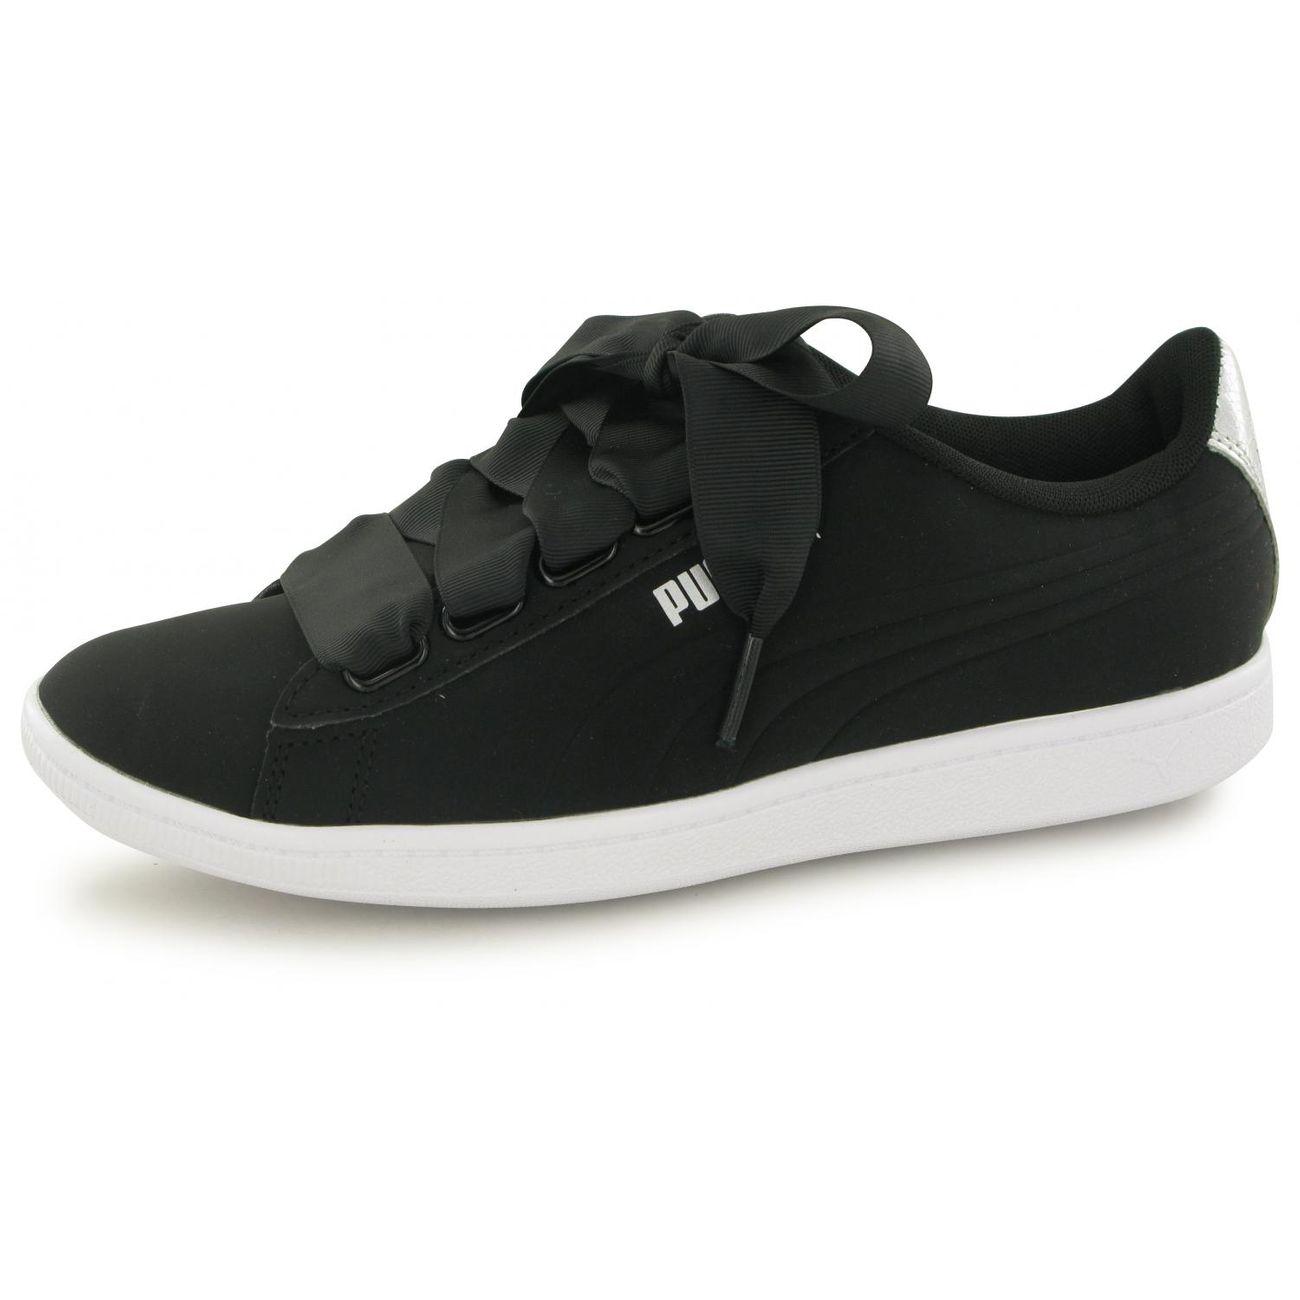 chaussures puma femmes vikky